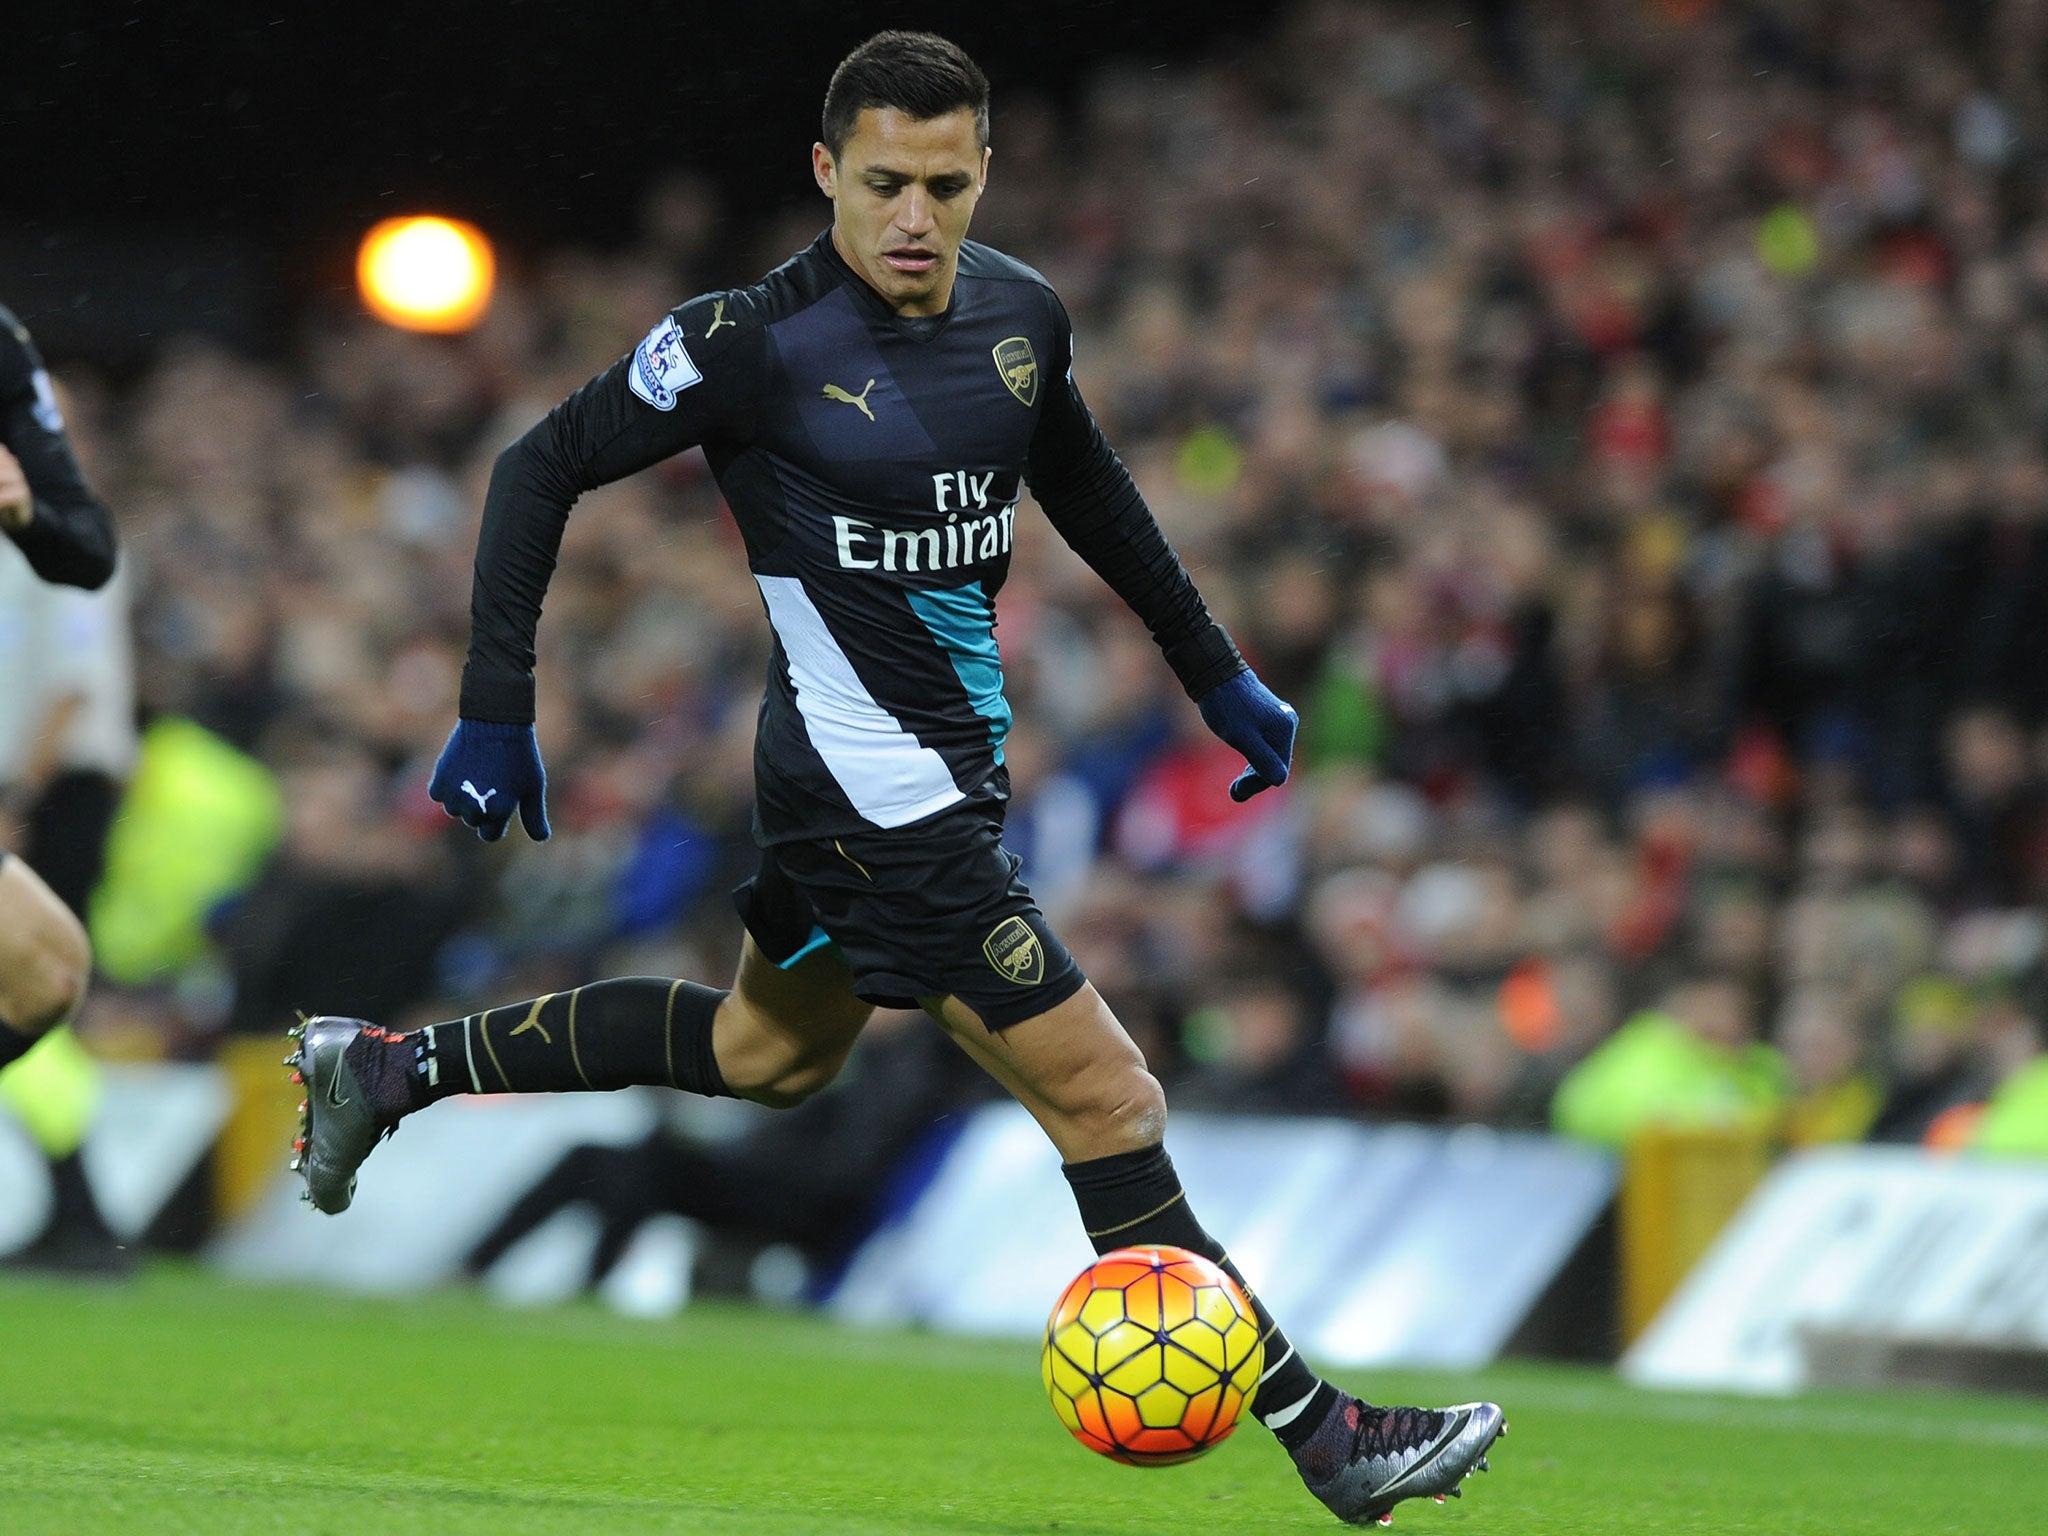 Arsenal can win an historic Premier League, FA Cup and Champions League treble this season, says Alexis Sanchez